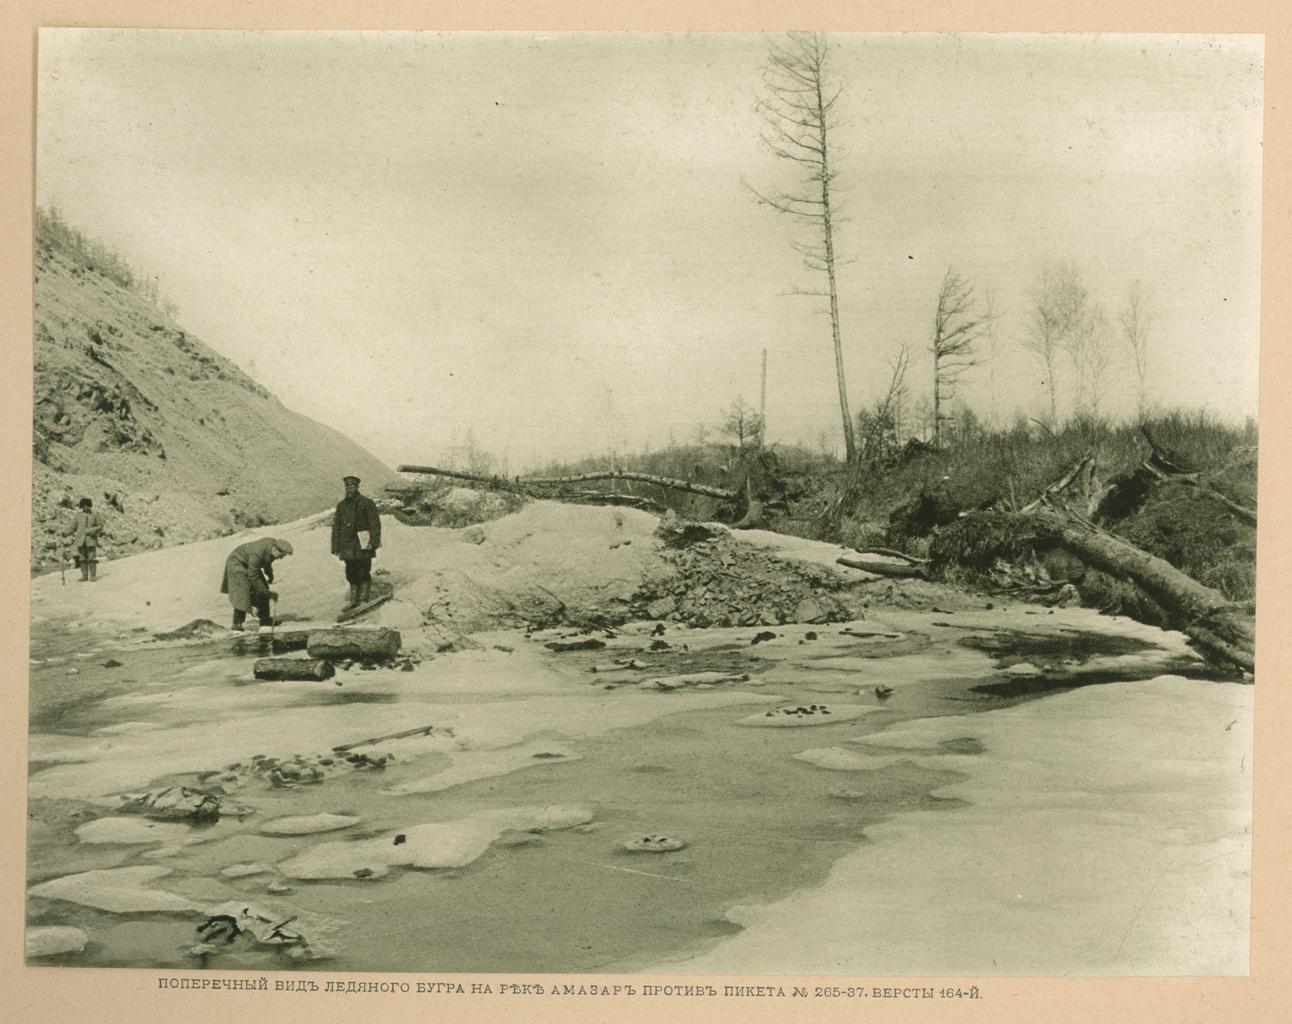 Верста 164. Поперечный вид ледяного бугра на реке Амазар напротив пикета № 265-37